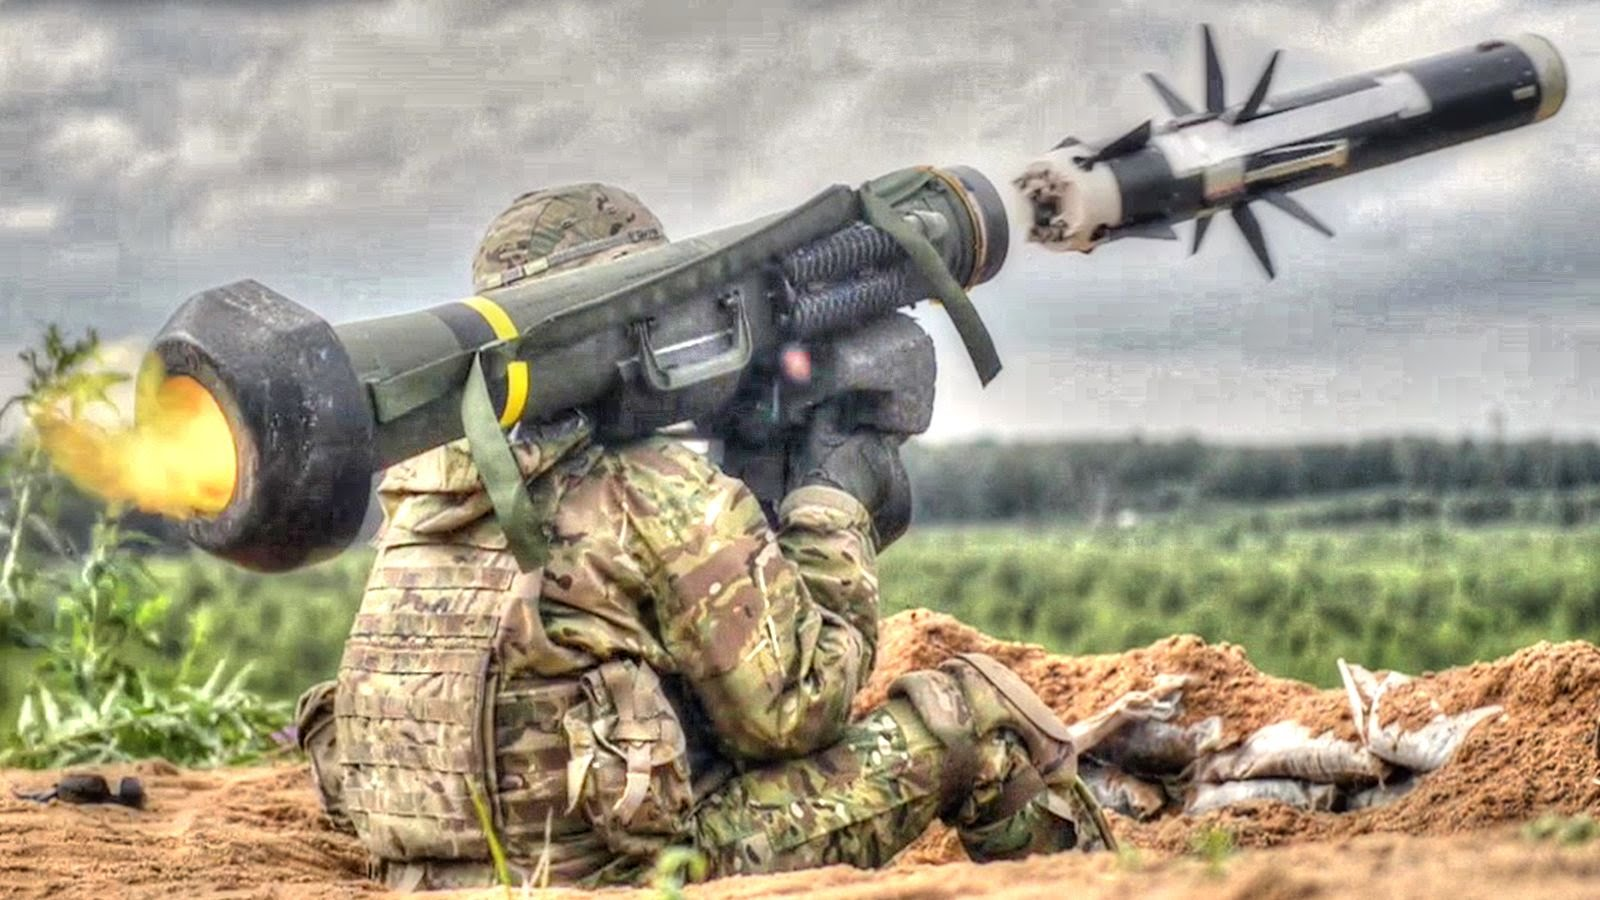 Sistemele Javelin, simbol al colaborarii militare dintre SUA și Ucraina